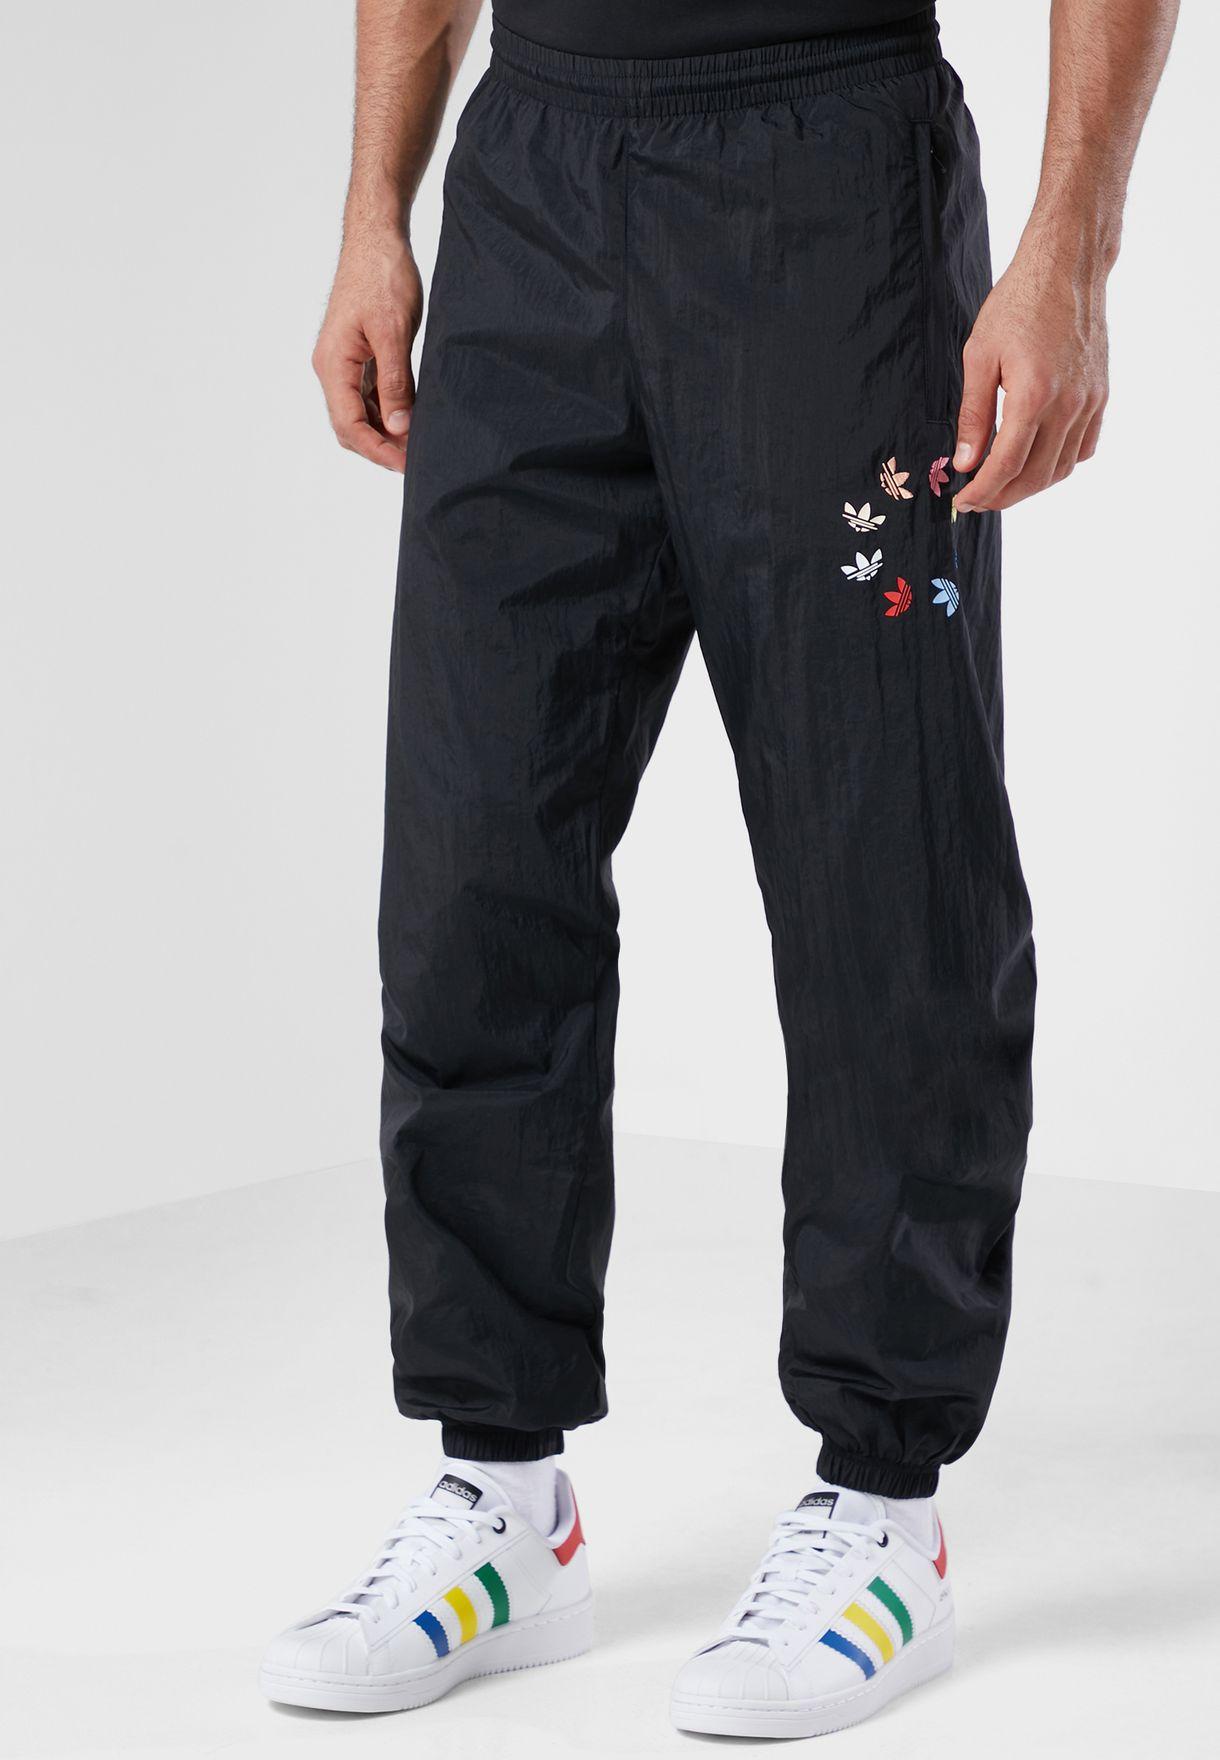 Shattered Trefoil  Woven Sweatpants